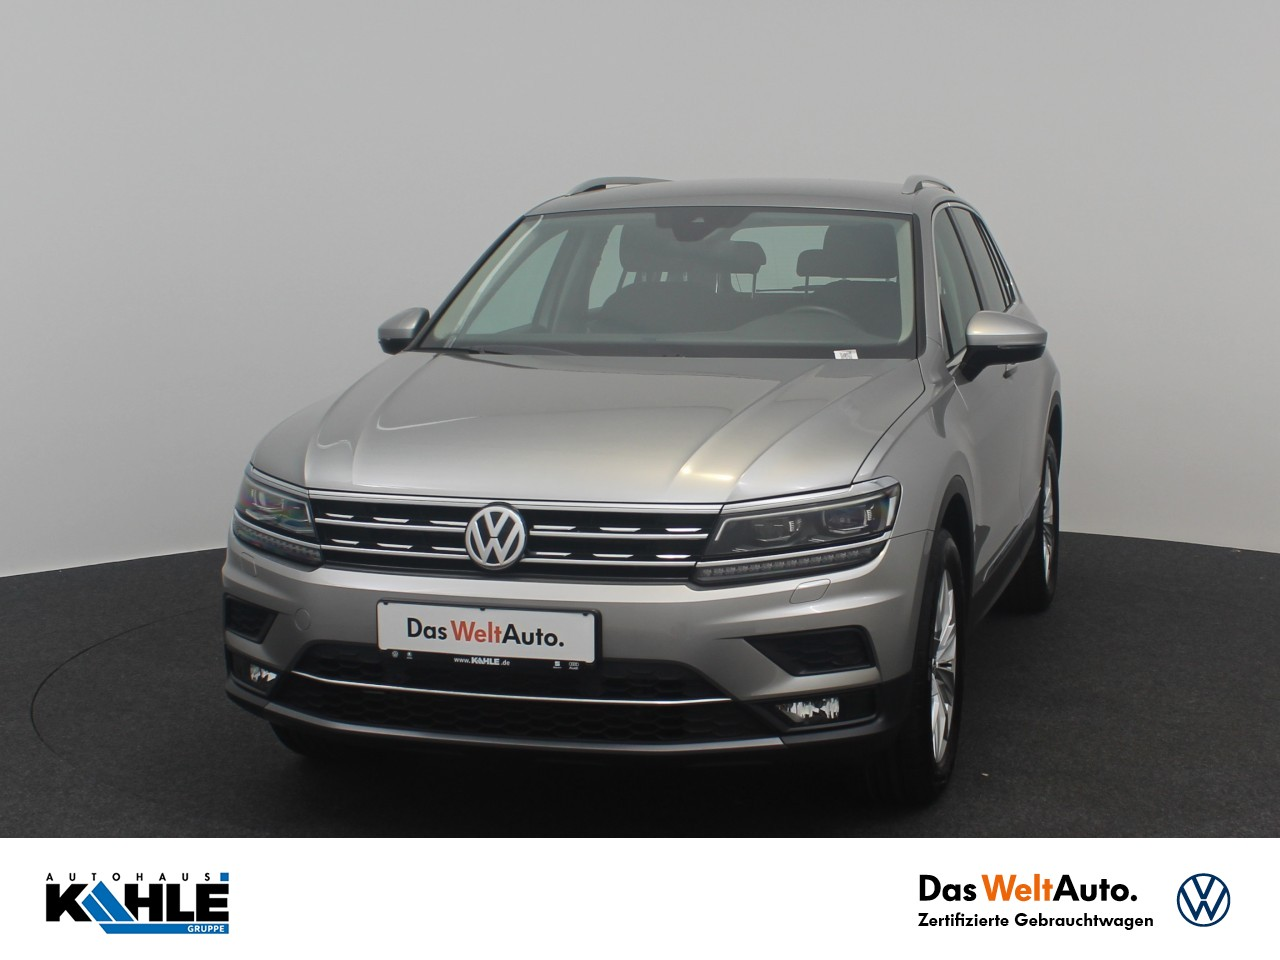 Volkswagen Tiguan 2.0 TDI Highline 4 Motion Navi Active Info AHK LED Klima, Jahr 2018, Diesel